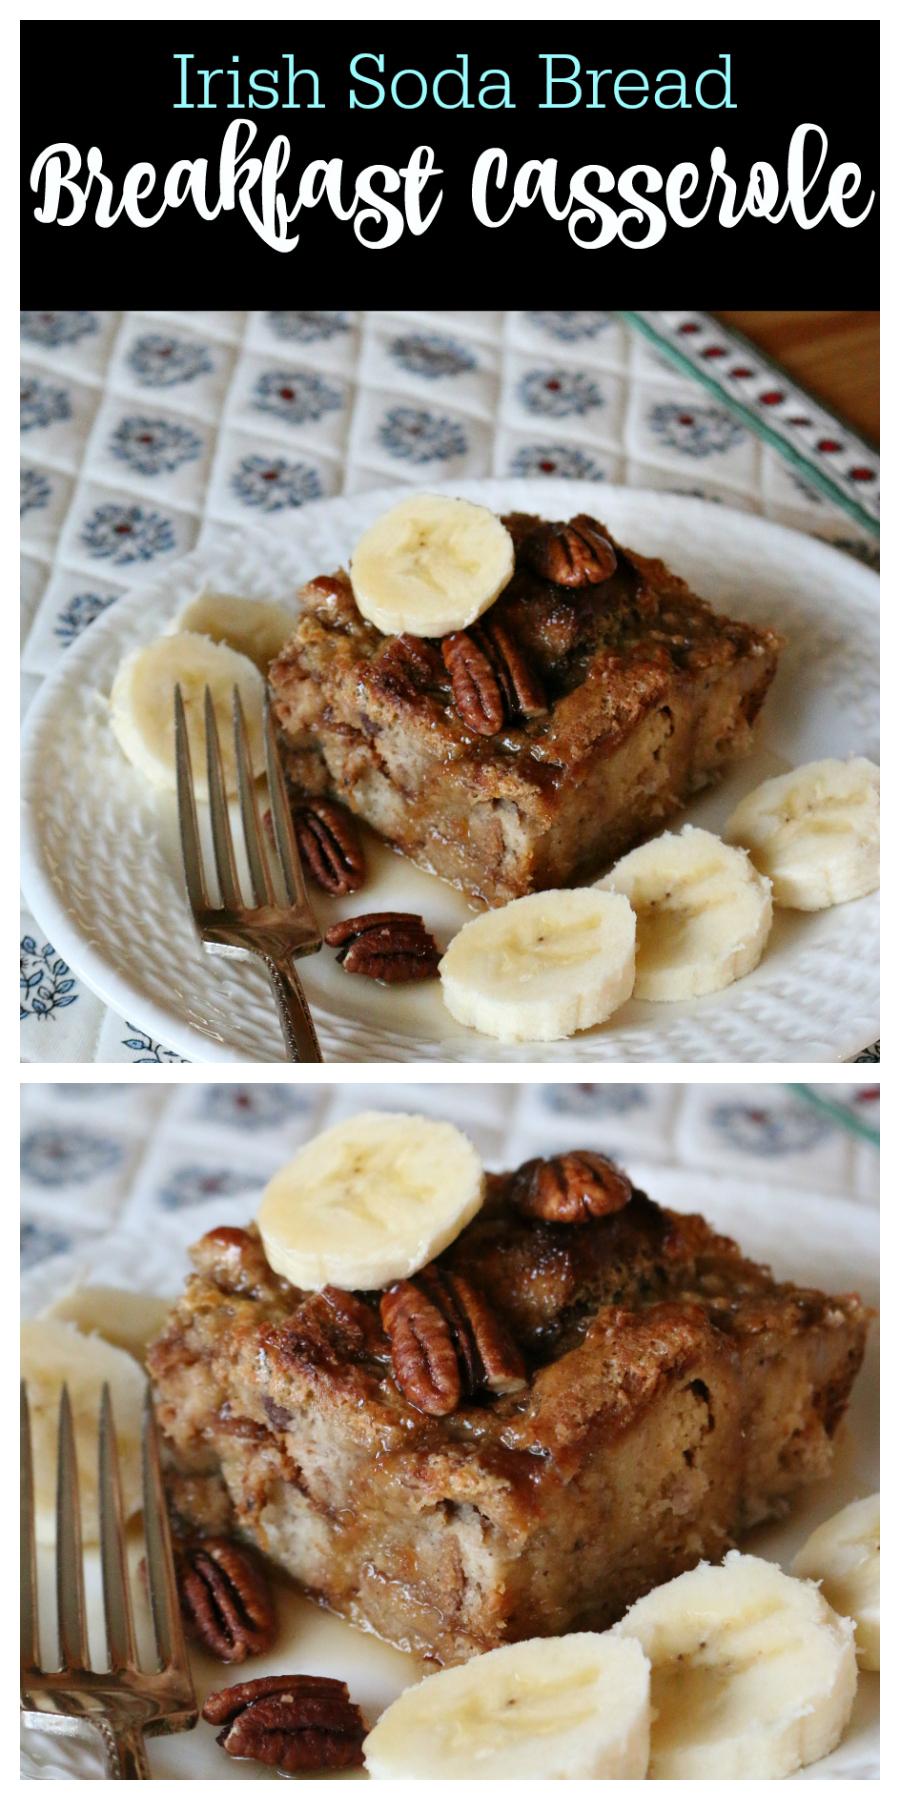 Irish Soda Bread Breakfast Casserole | CeceliasGoodStuff.com | Good Food for Good People